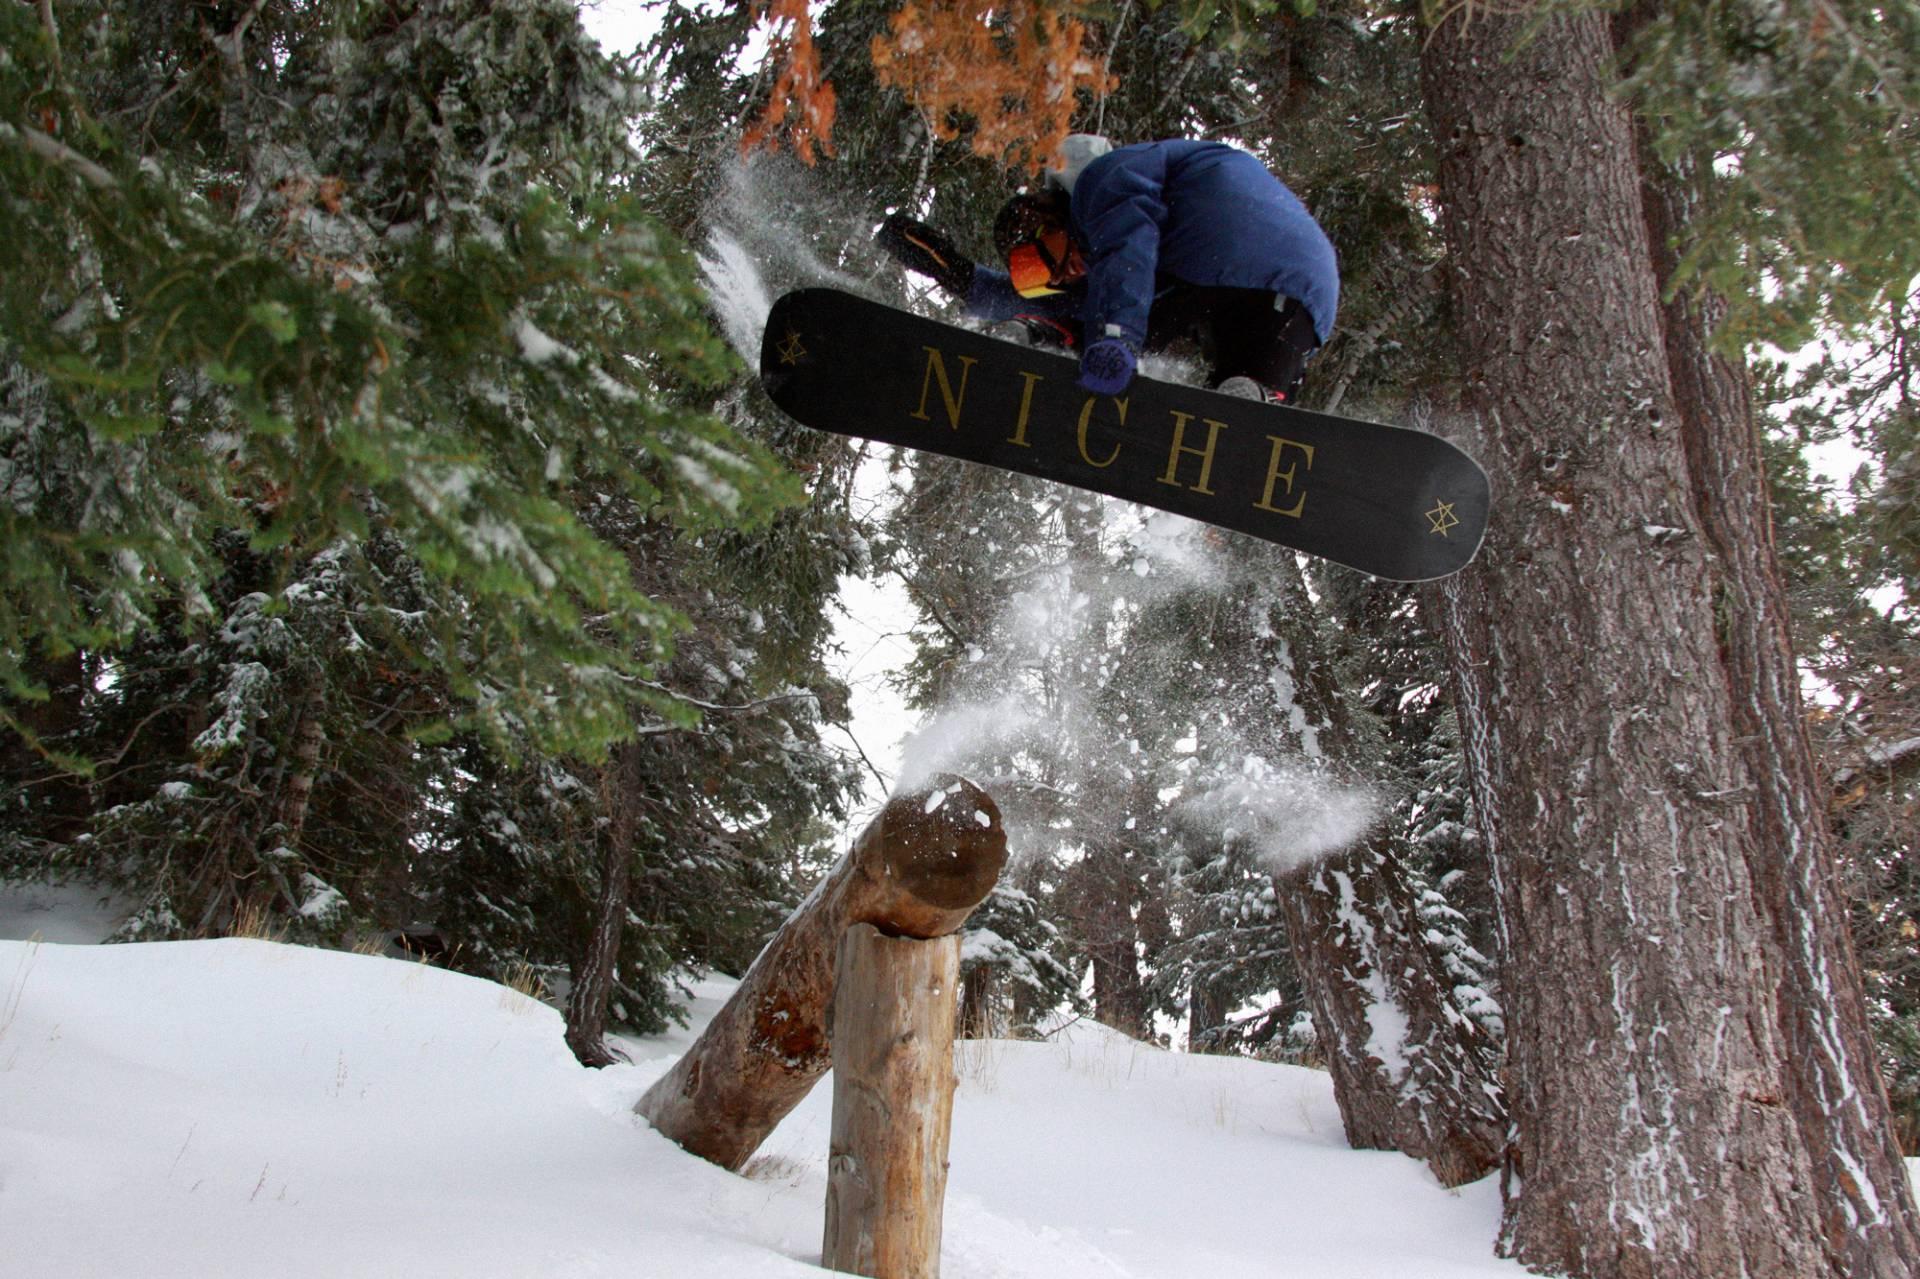 acheter populaire 0393e 0ae2b Rude Boys Snowboard & Skateboard Shop : Fun stuff for you ...